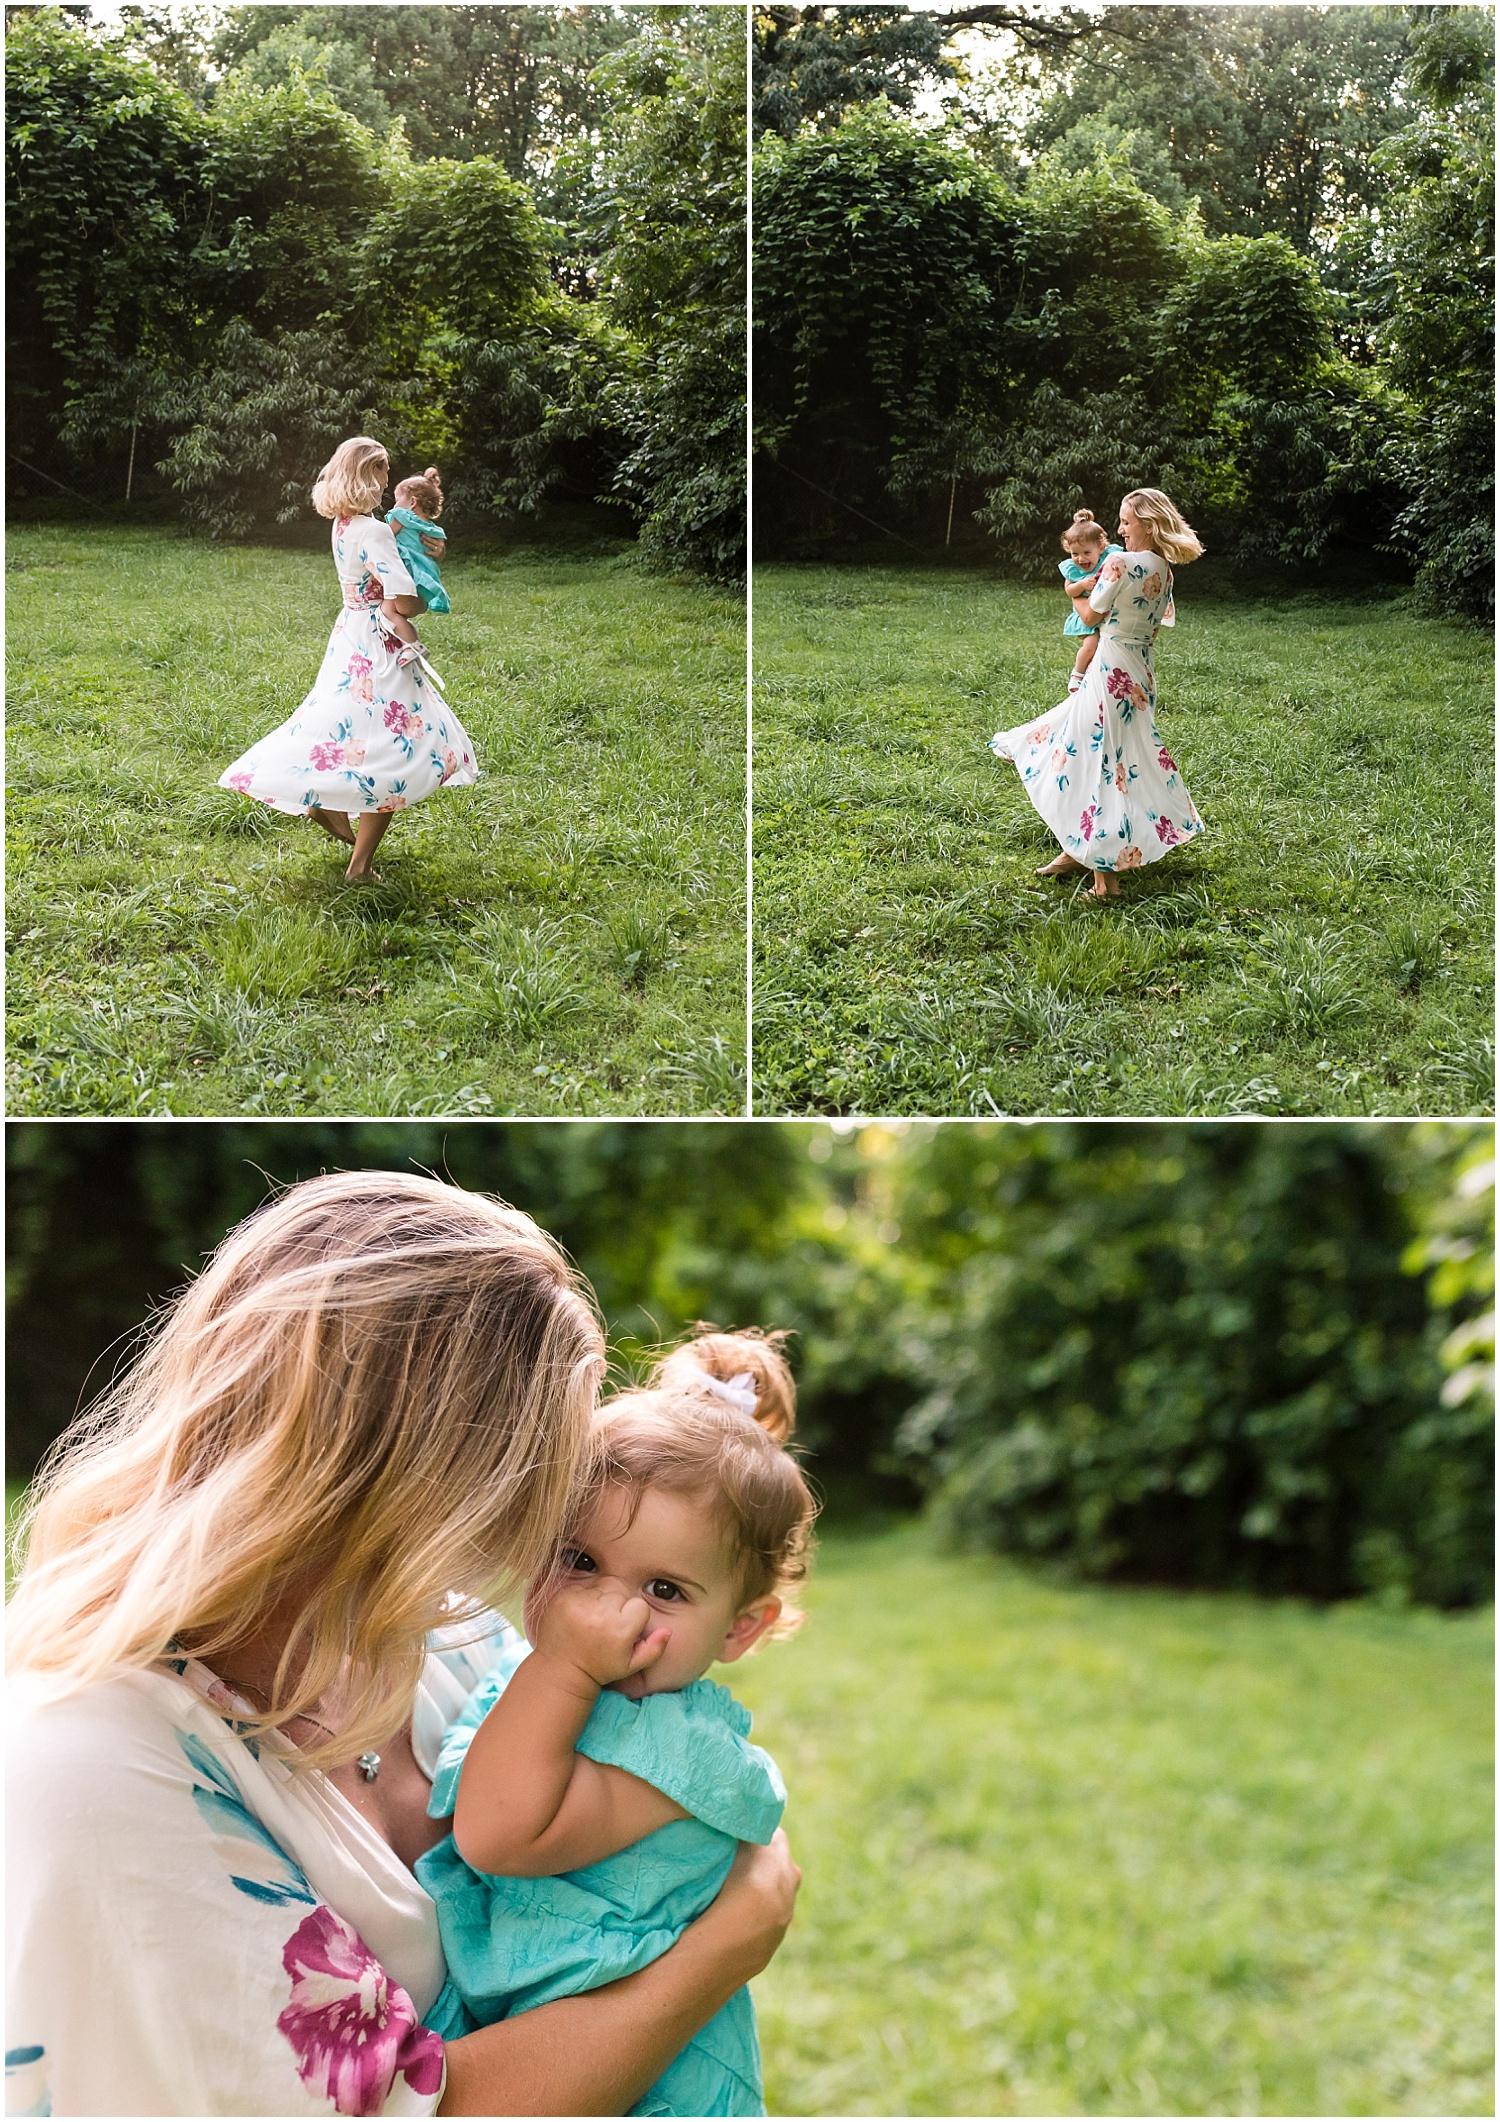 kirkwood-atlanta-family-session-tabitha-maegan-photography (11).jpg